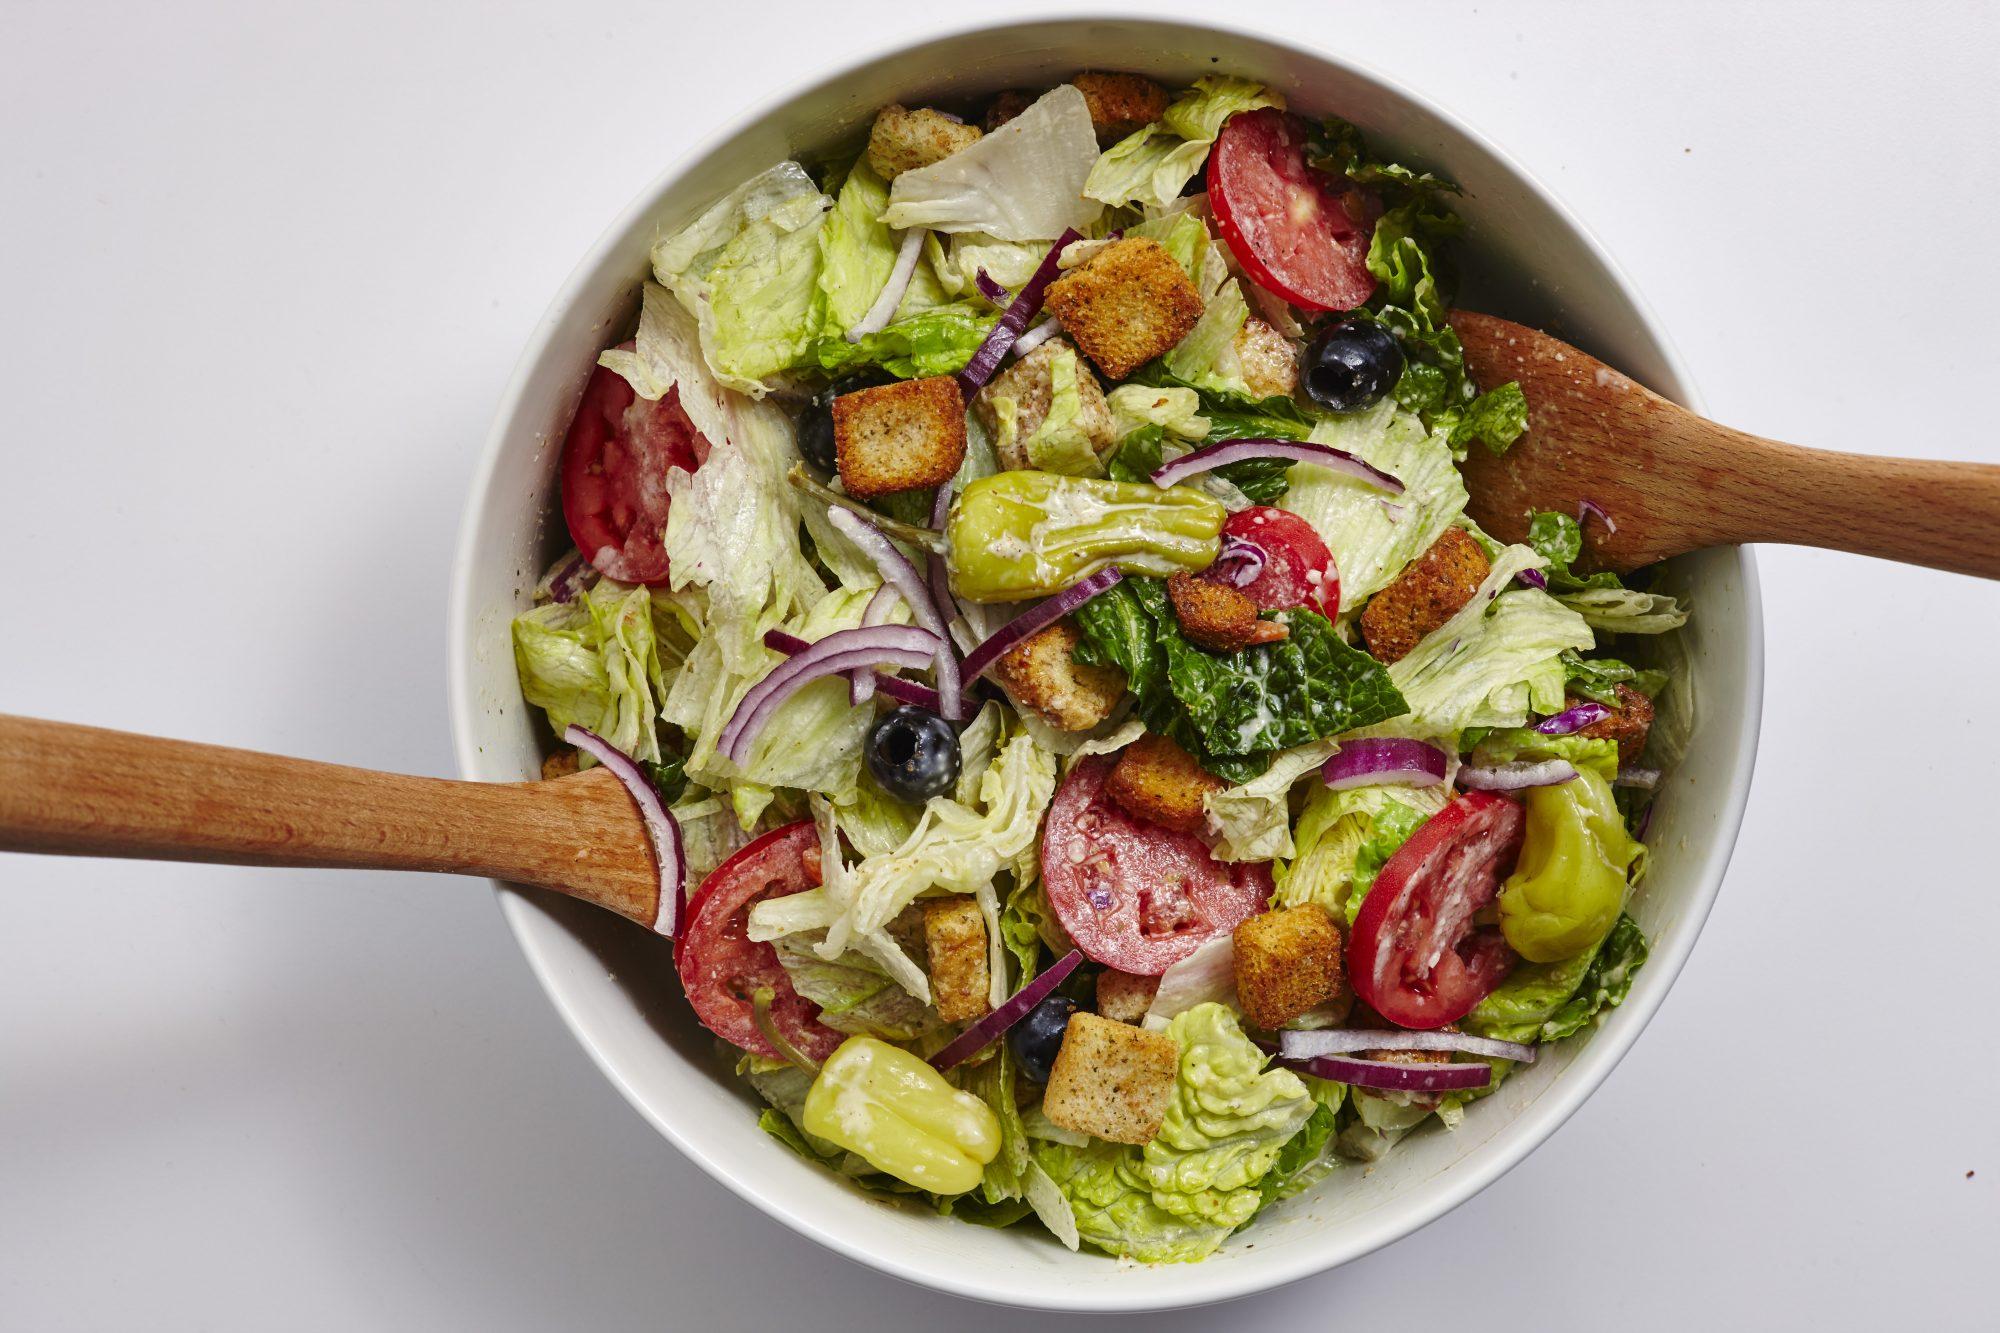 copycat olive garden salad recipe myrecipes - Garden Salad Recipe